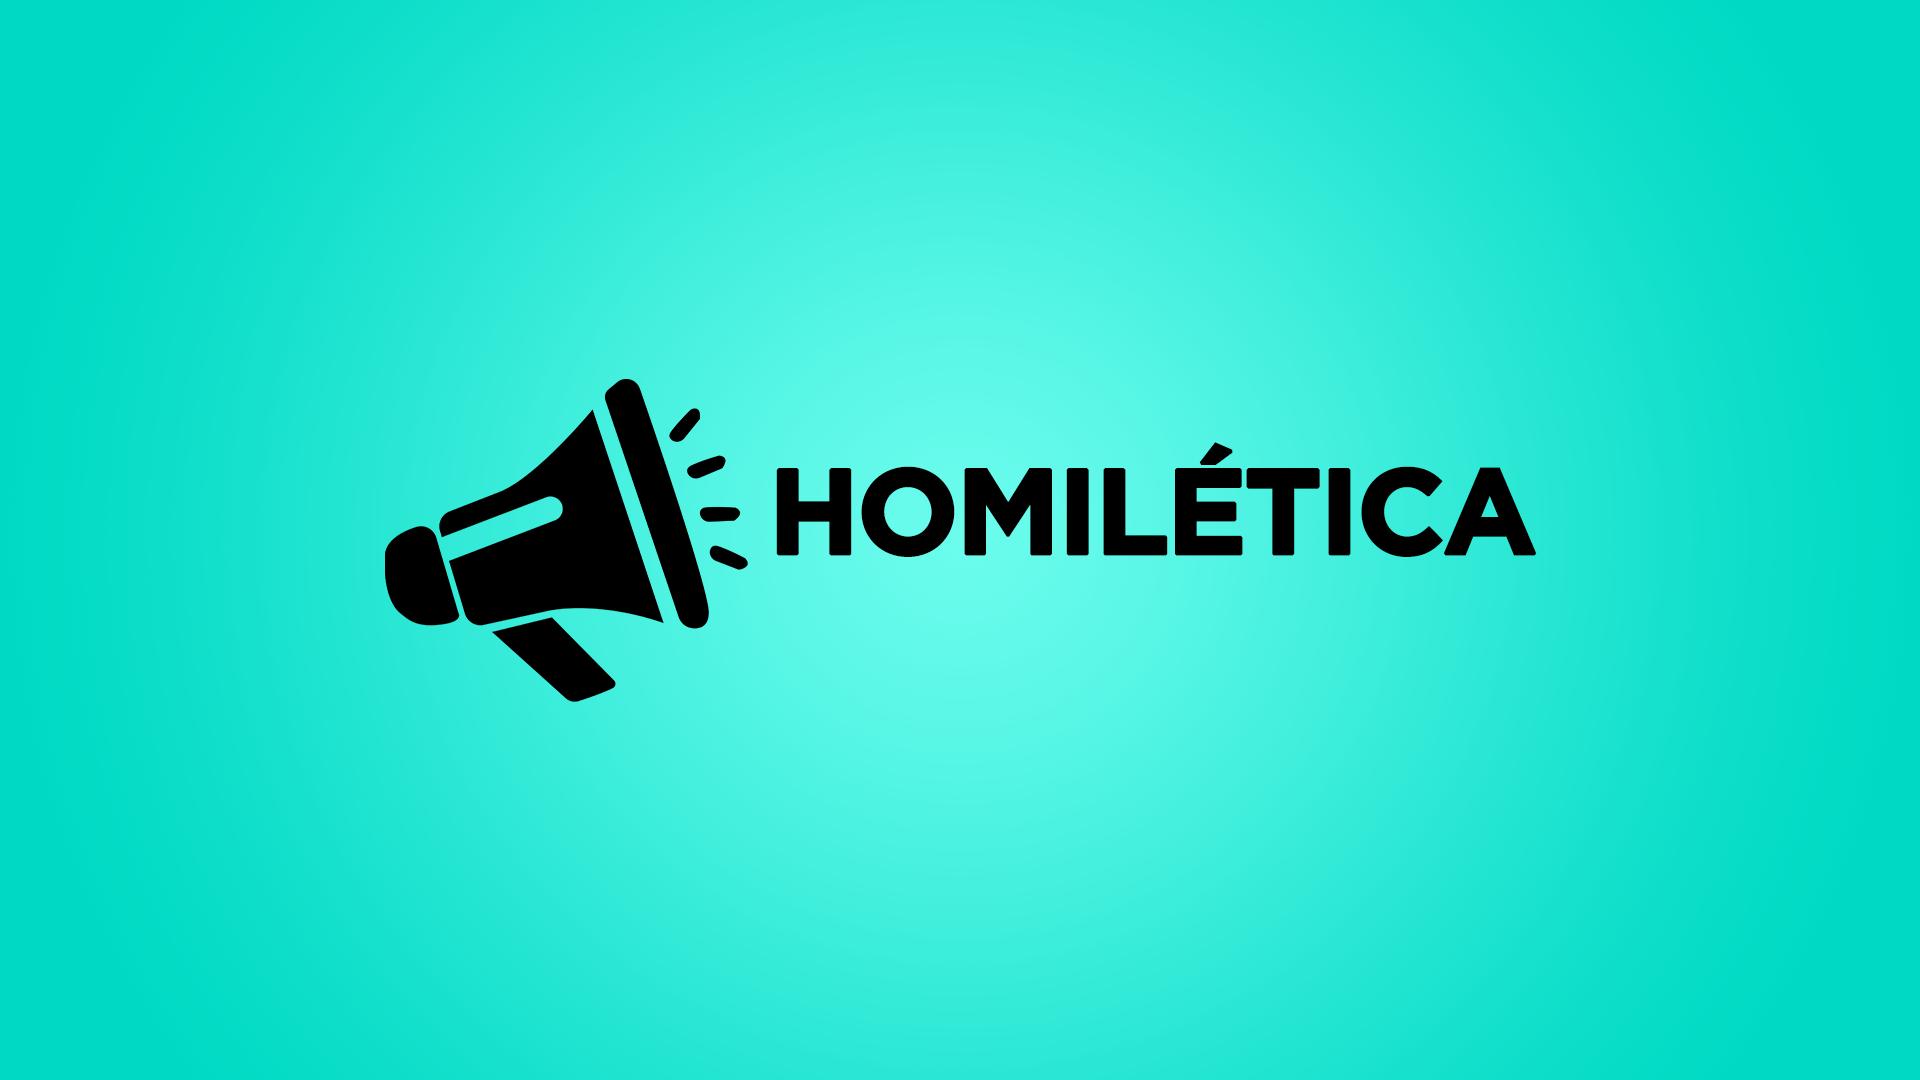 Homil%c3%89tica black